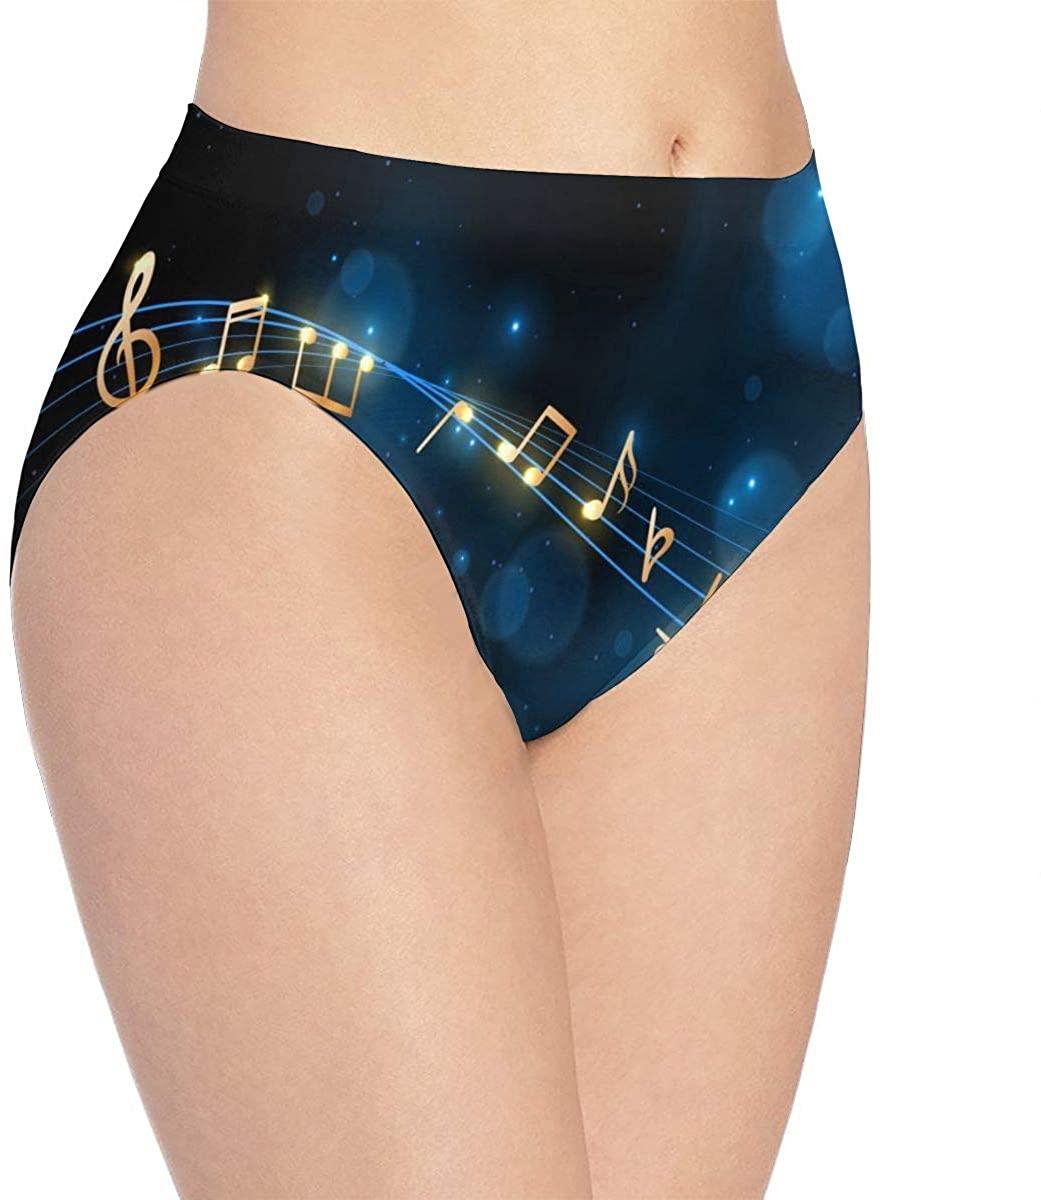 YQINING Womens Seamless Underwear Merry Christmas Bikini Panties Stretch Briefs Laser Cut